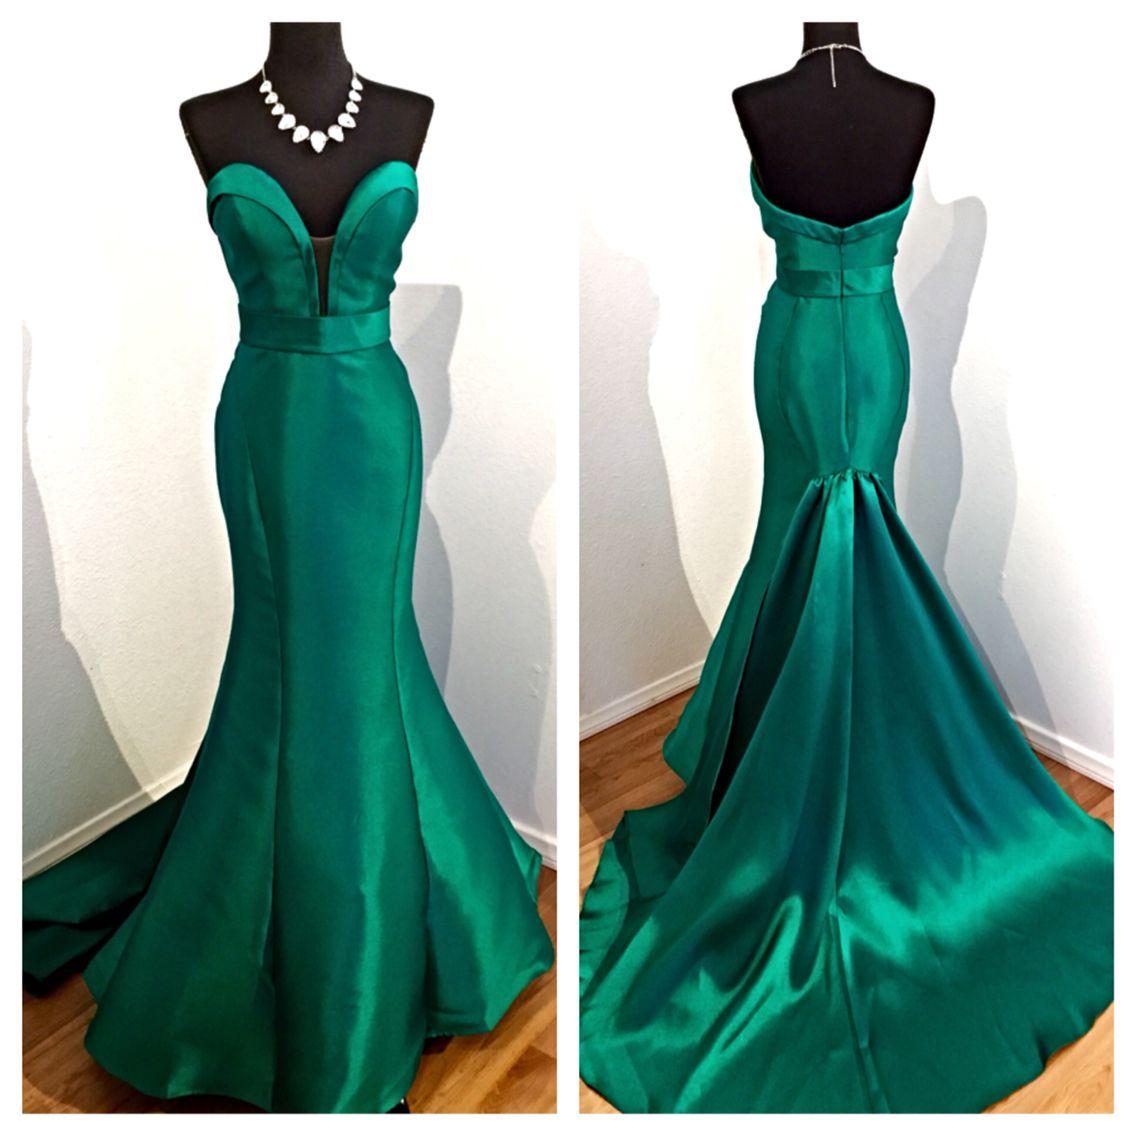 Prom dress new arrival 2016 mermaid pageant dress emerald green - An Emerald Beauty